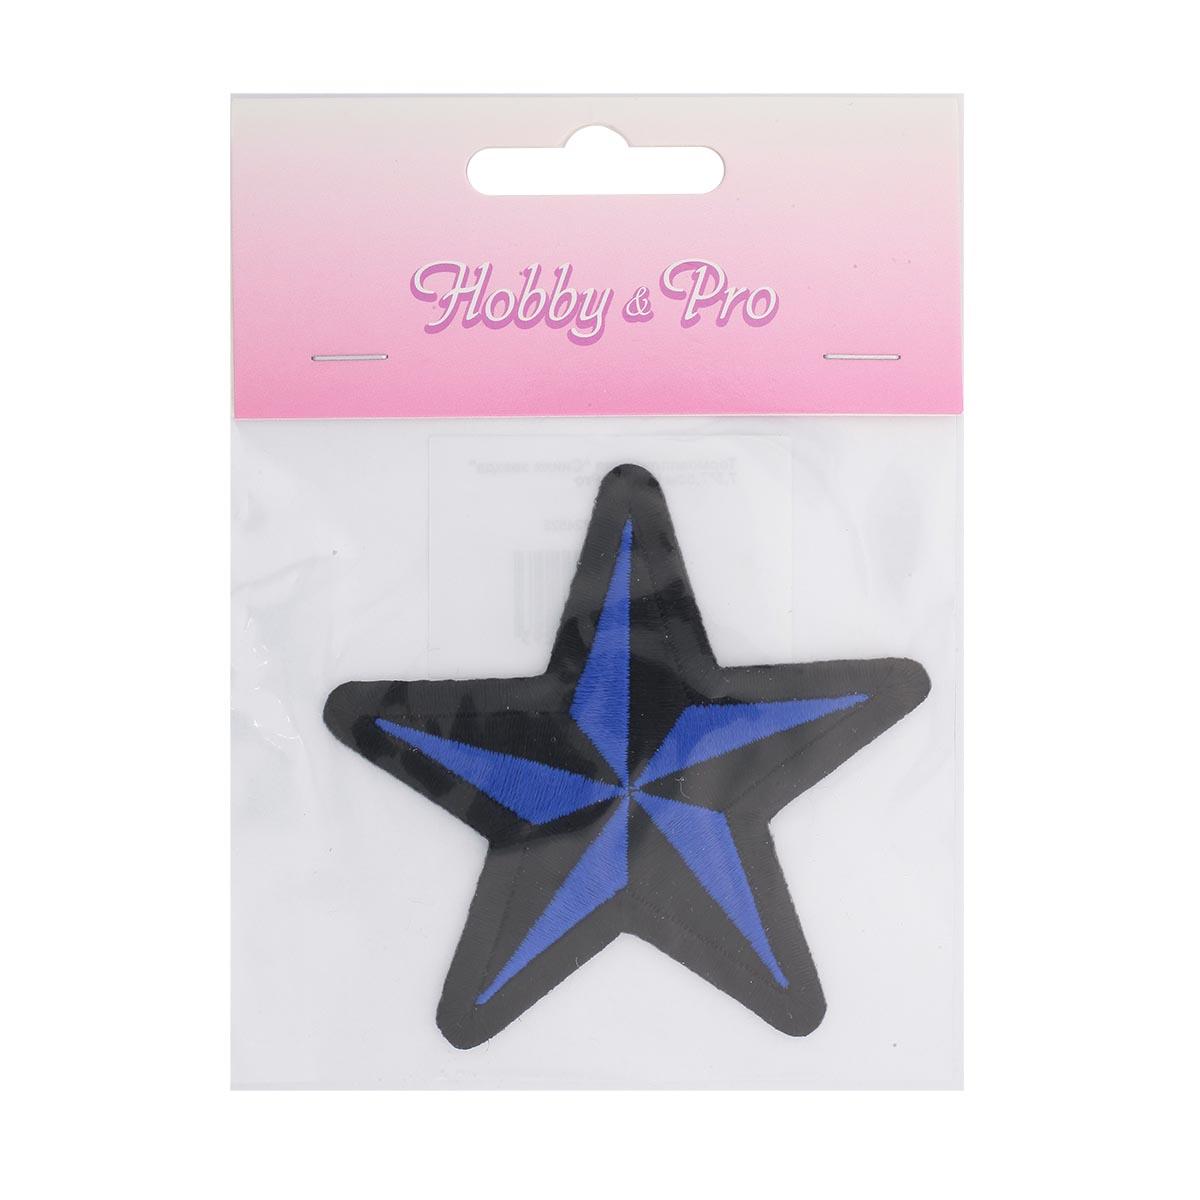 Термоаппликация 'Синяя звезда' 7,5*7,5см Hobby&Pro